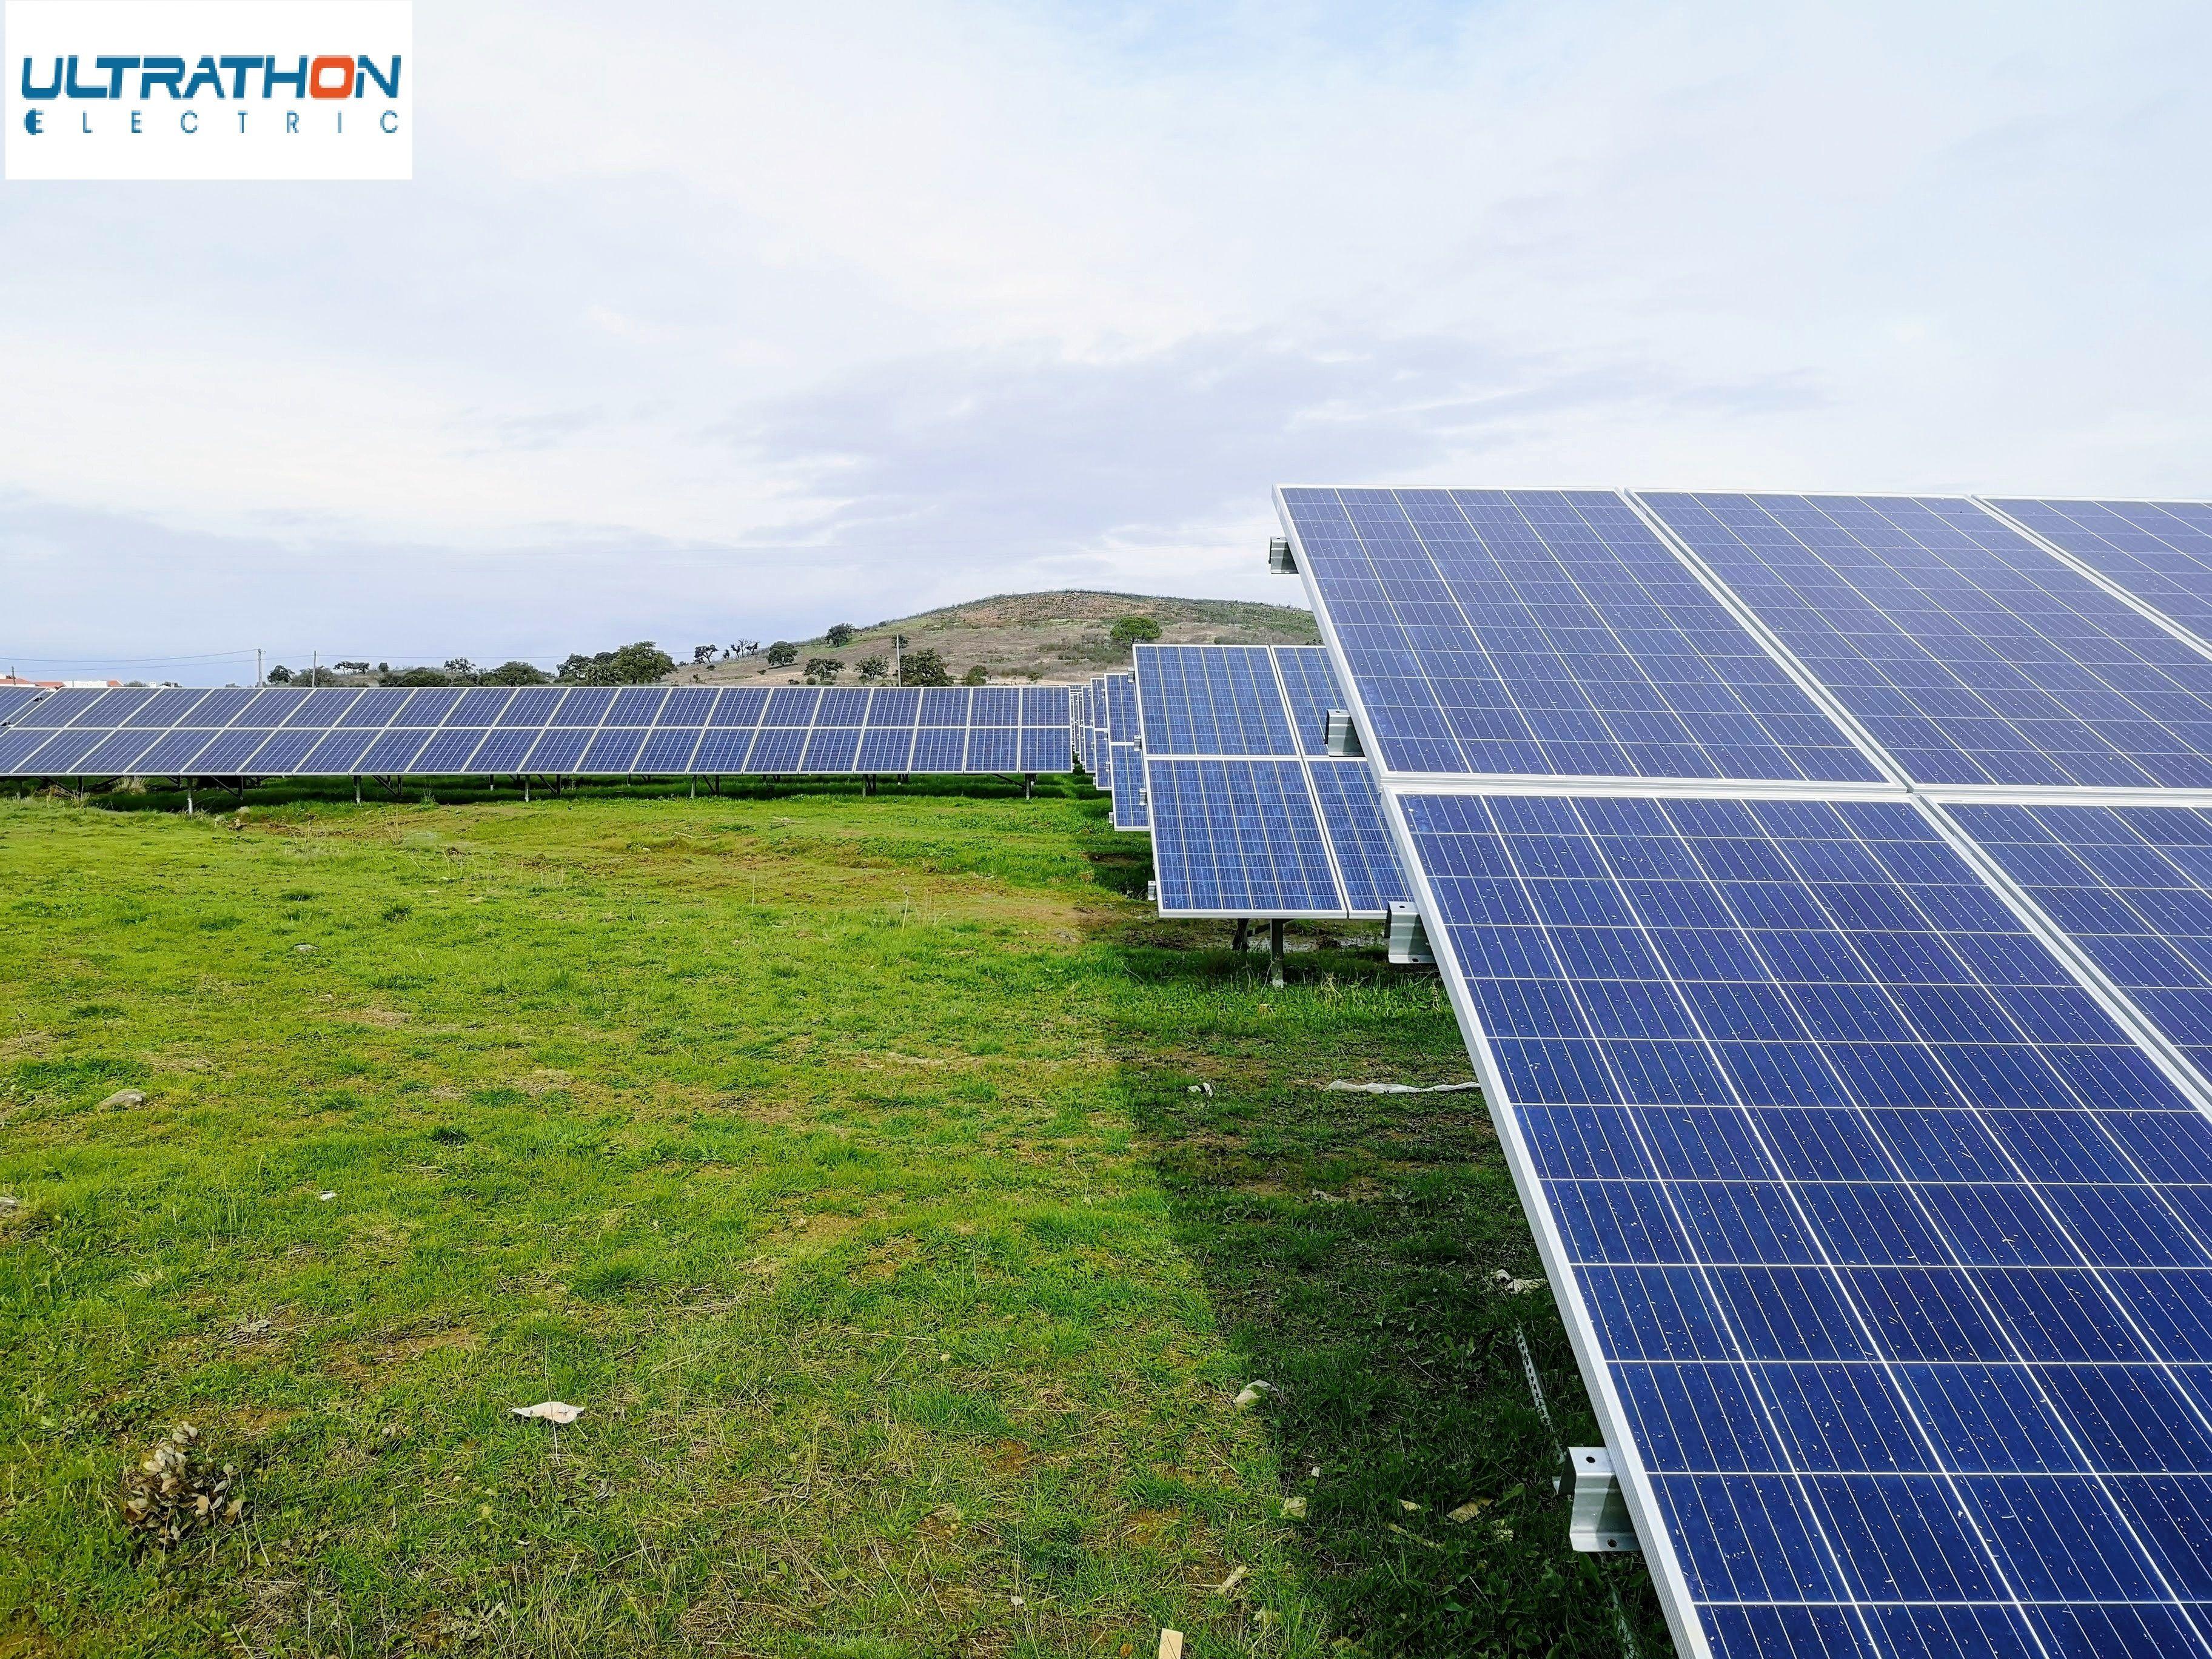 Pin By Ultrathon Electric On Solar Plant Installation Company Solar Solar Panels Advantages Of Solar Energy